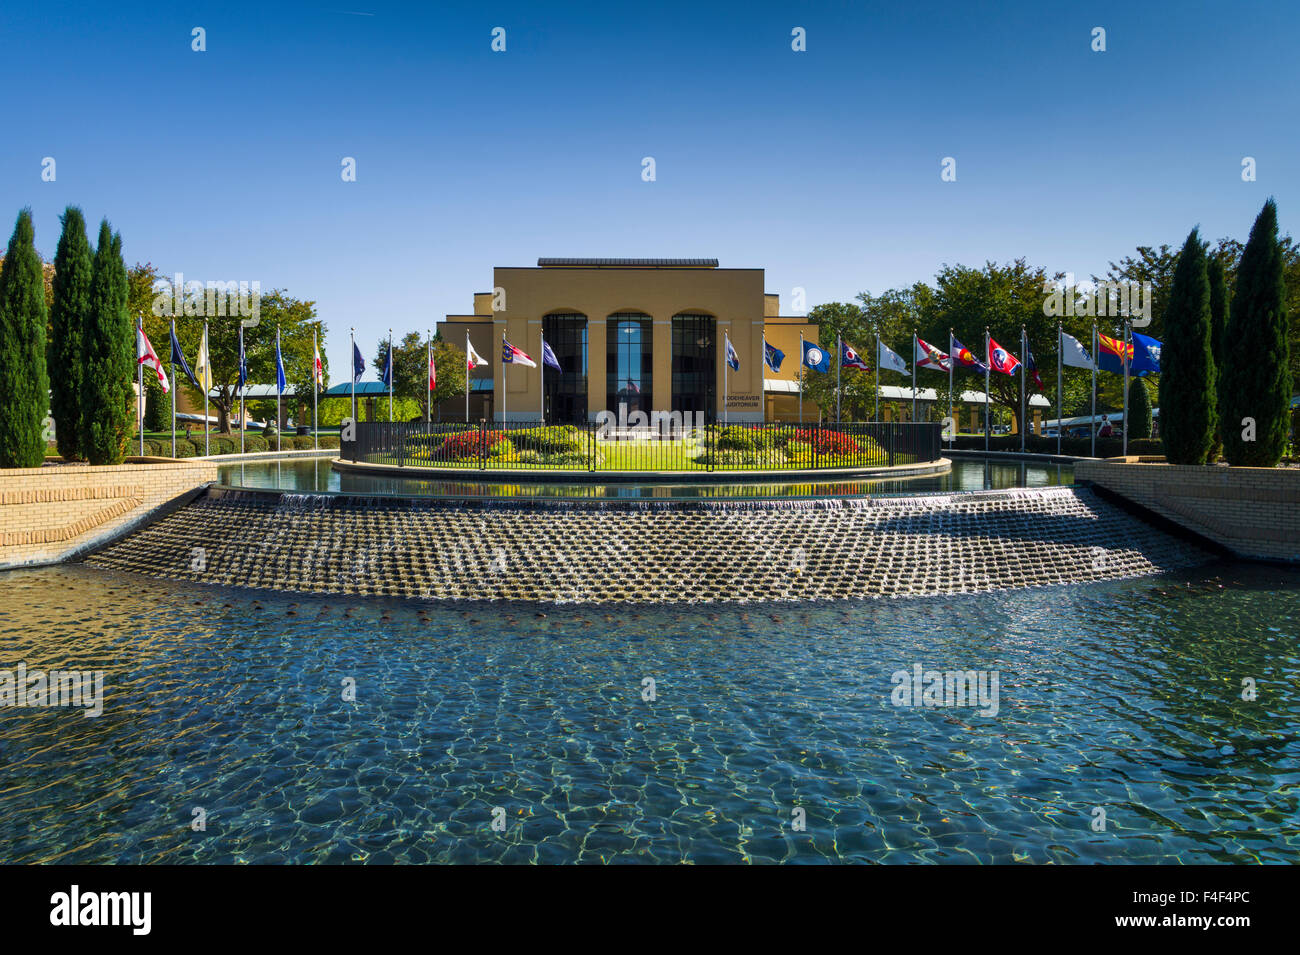 South Carolina, Greenville, Bob Jones University, Rodeheaver Auditorium from the Fountain Bridge Stock Photo